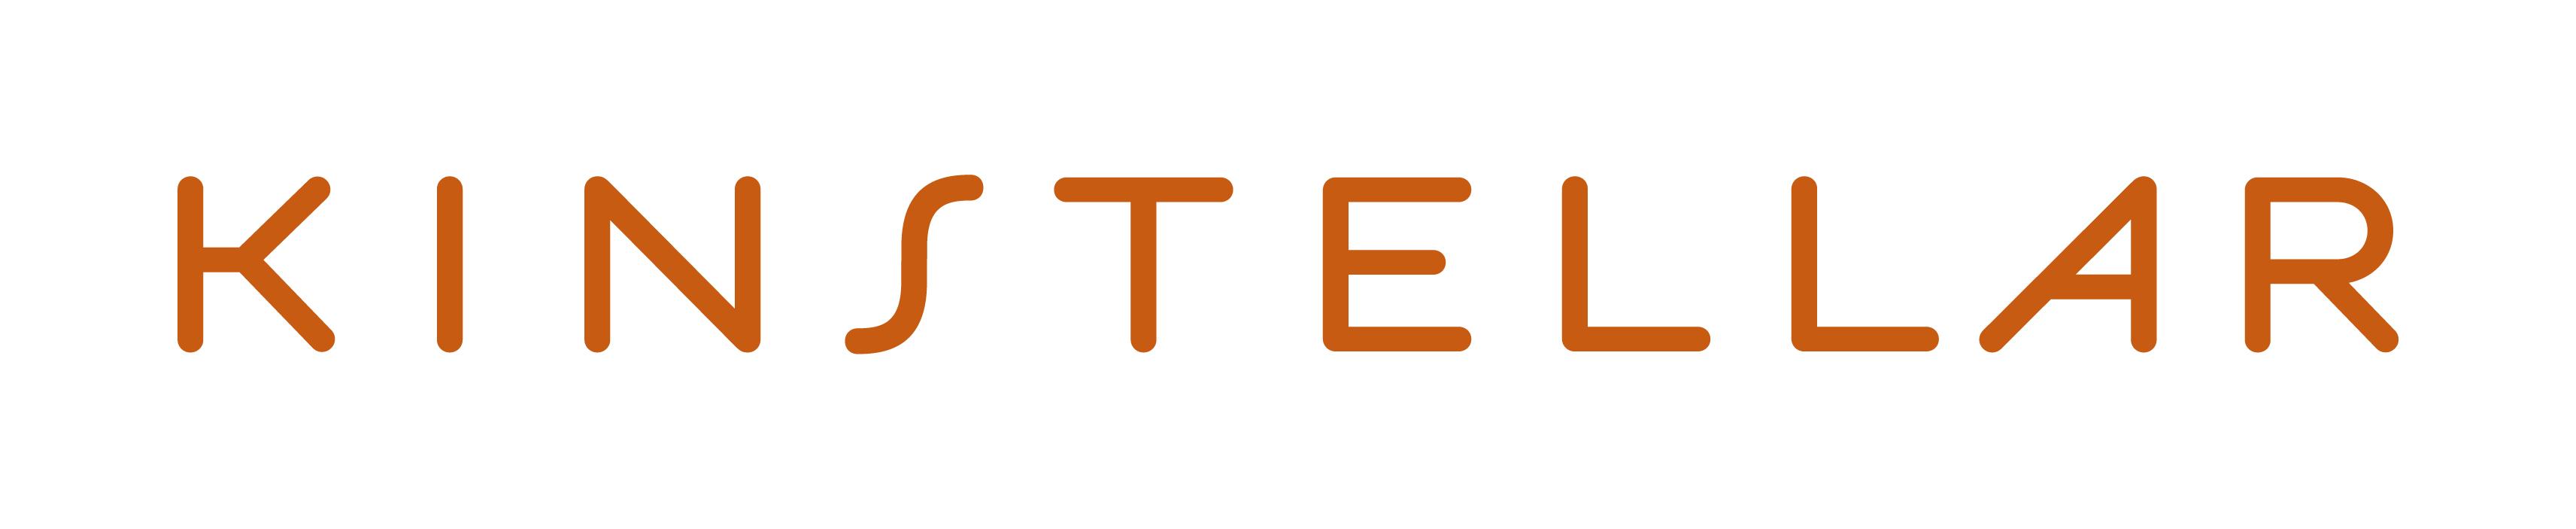 kinstellar logo